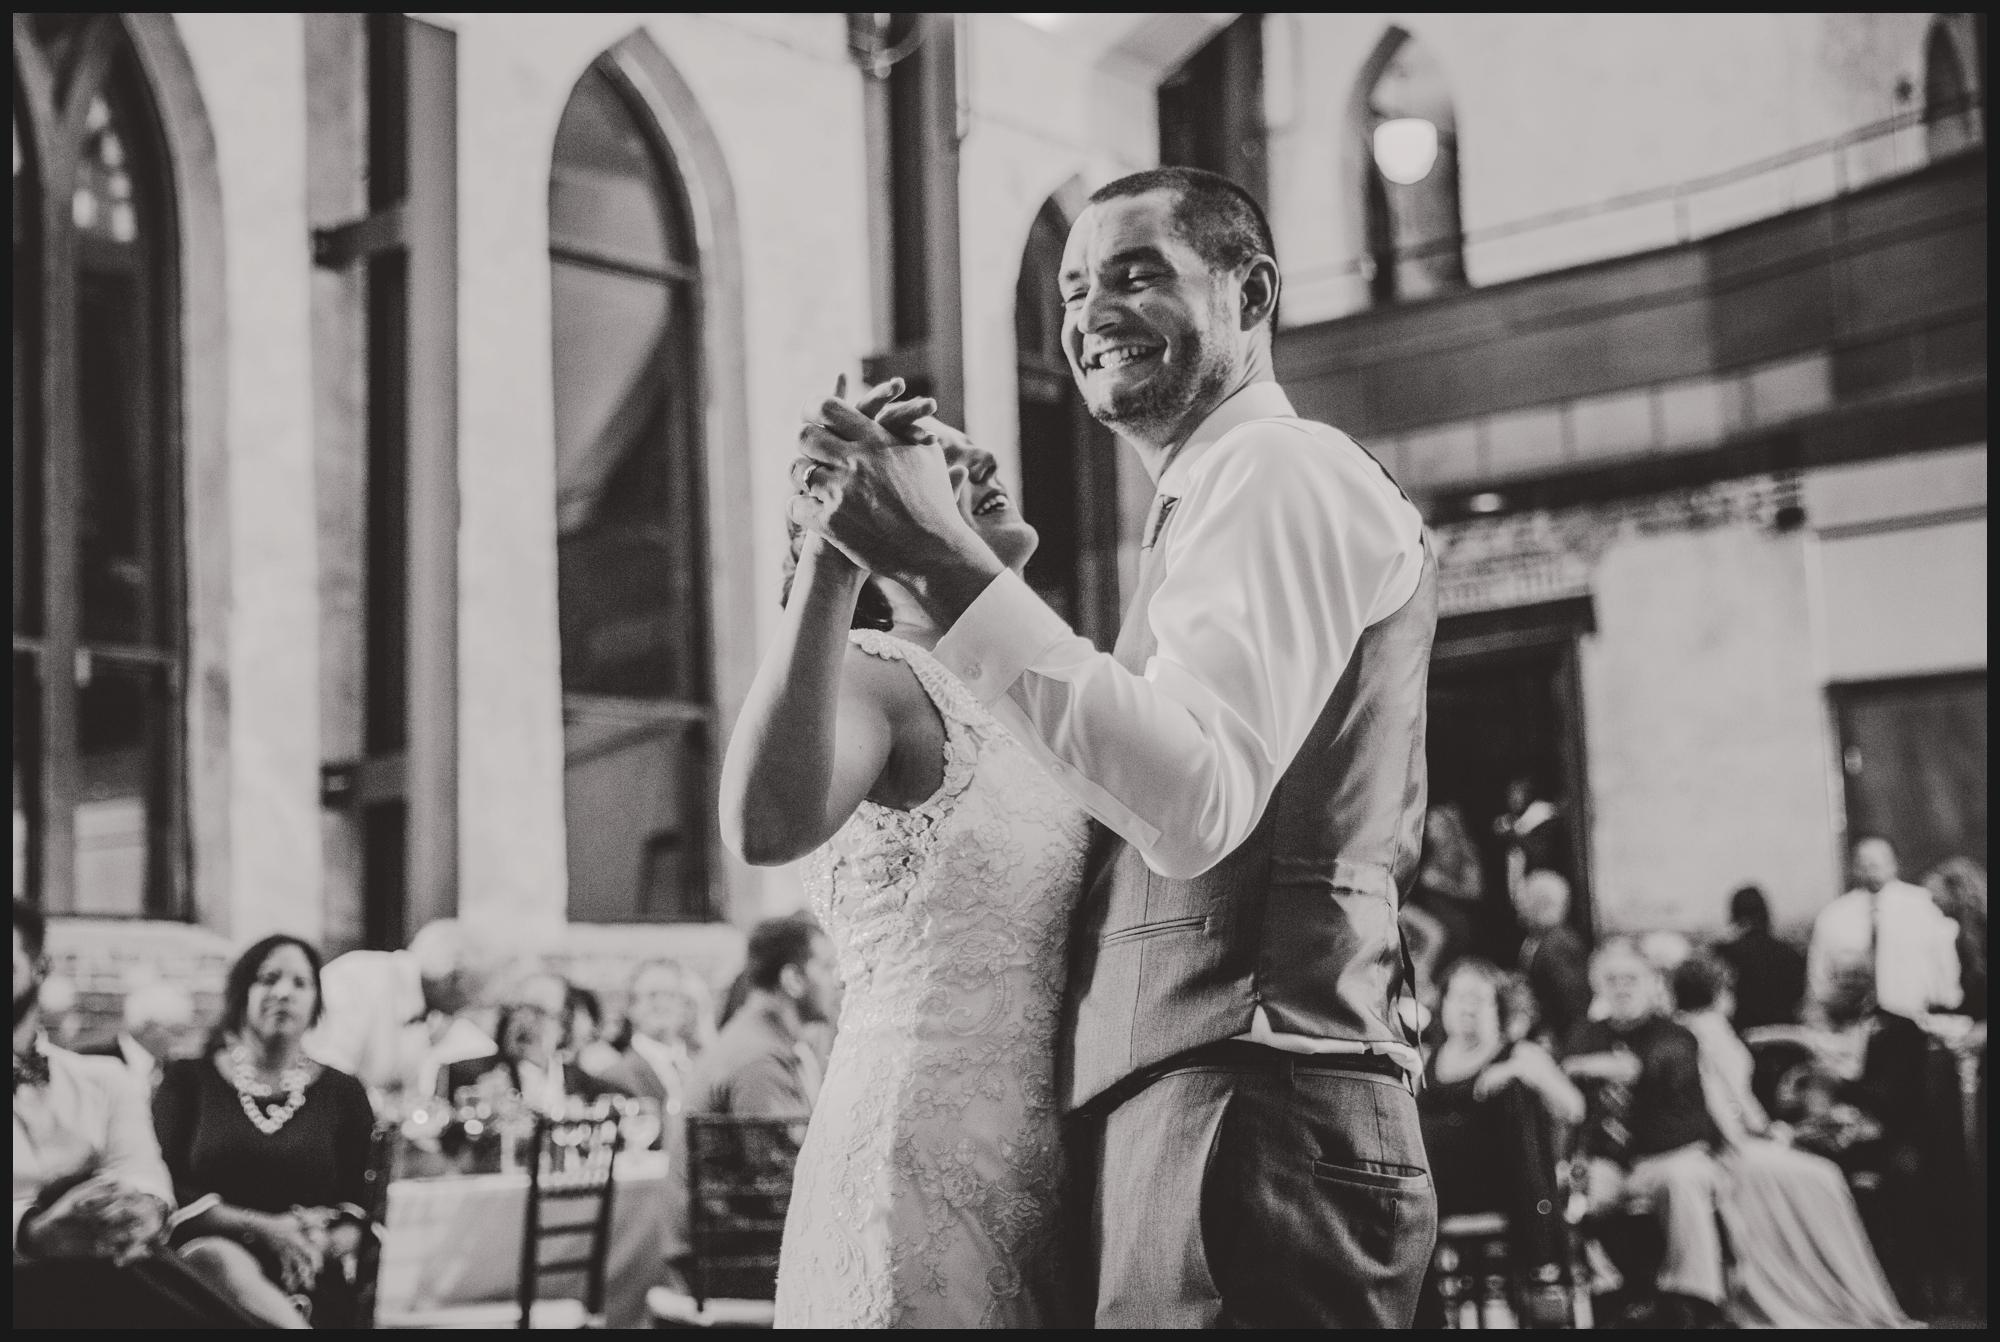 Orlando-Wedding-Photographer-destination-wedding-photographer-florida-wedding-photographer-bohemian-wedding-photographer_0658.jpg